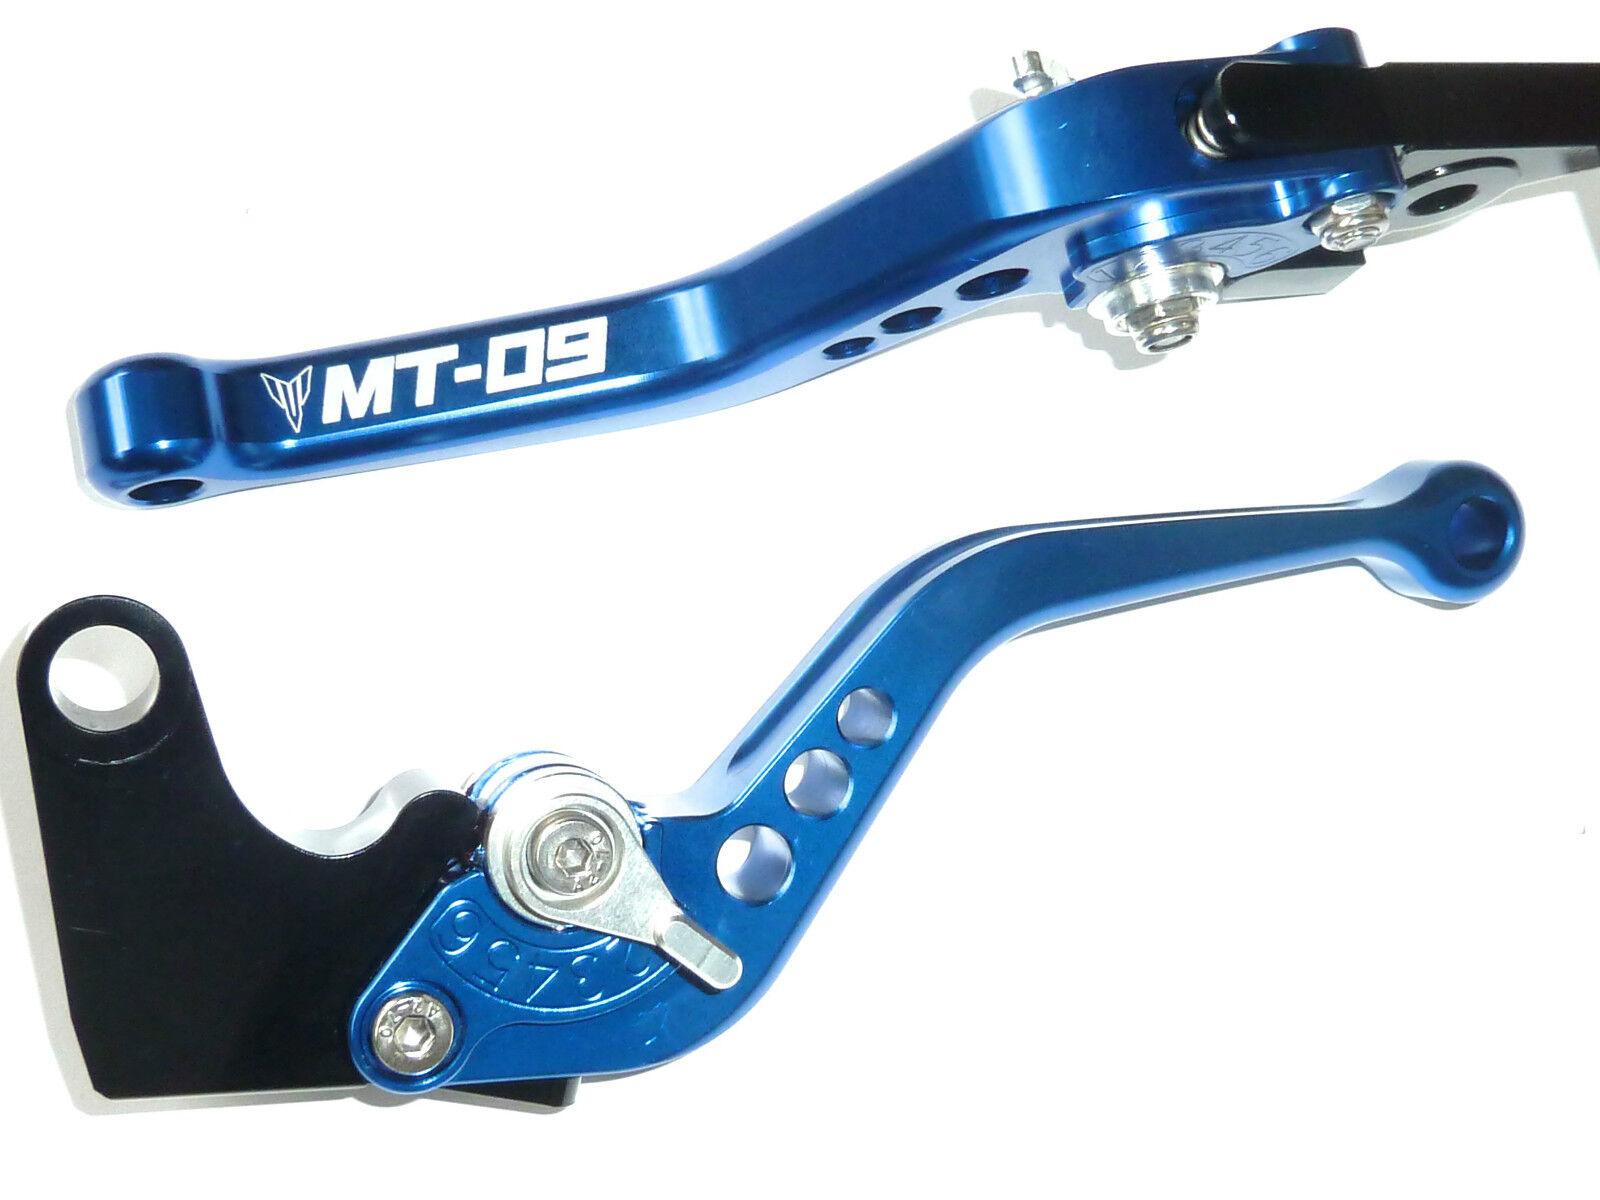 Yamaha Mt-09 Kurz Blaue Brems- & Kupplungshebel Satz Race Track Geprägt R15c5